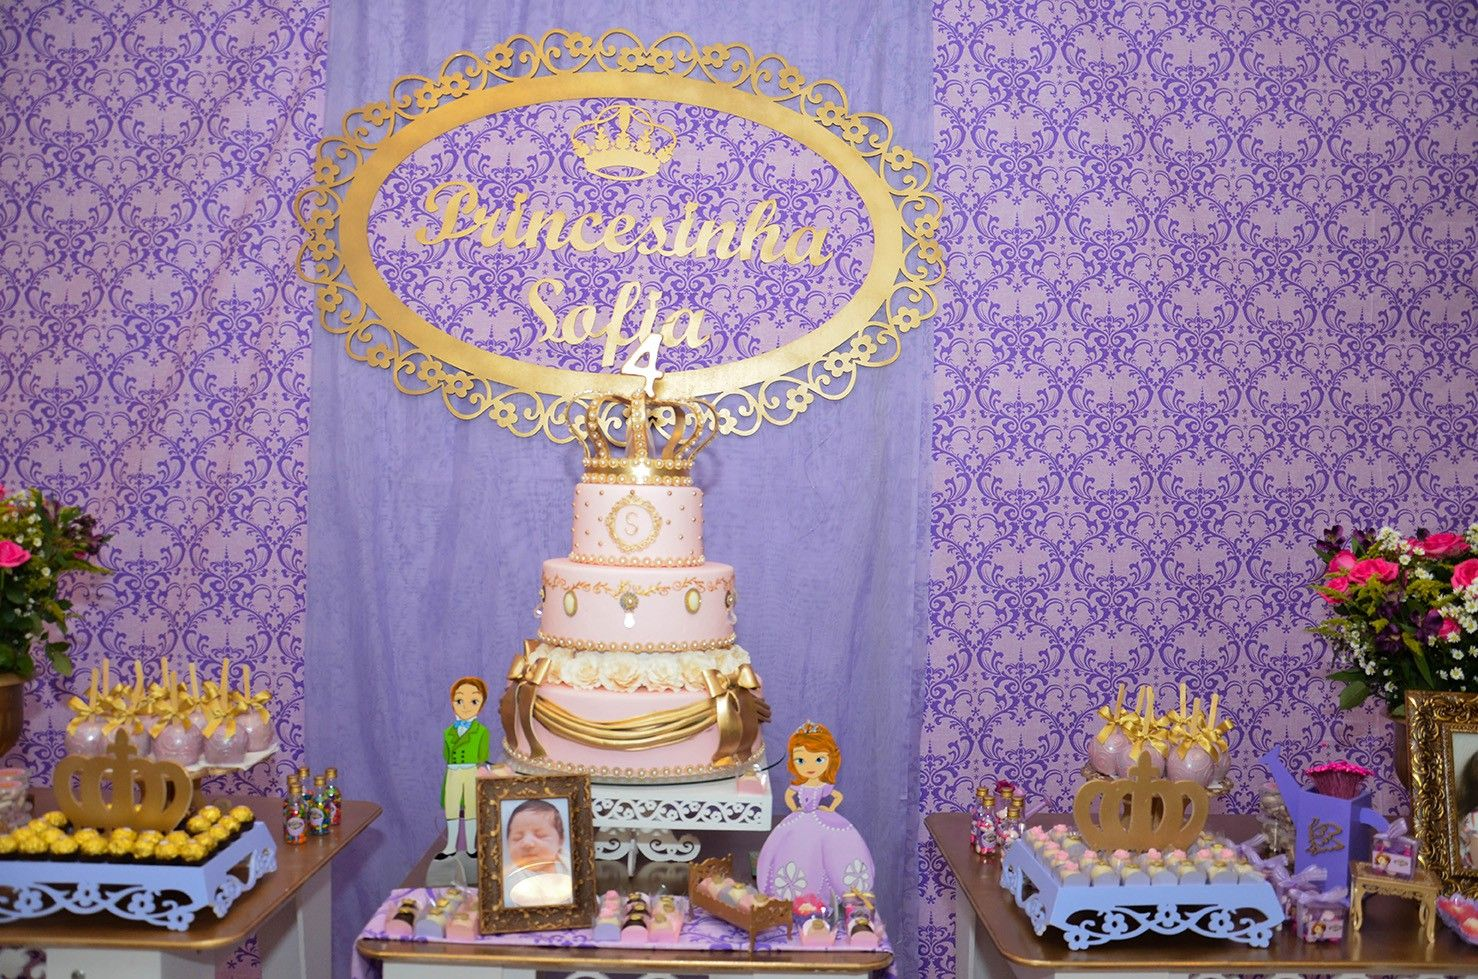 princesa sofia festa rosa - Pesquisa Google